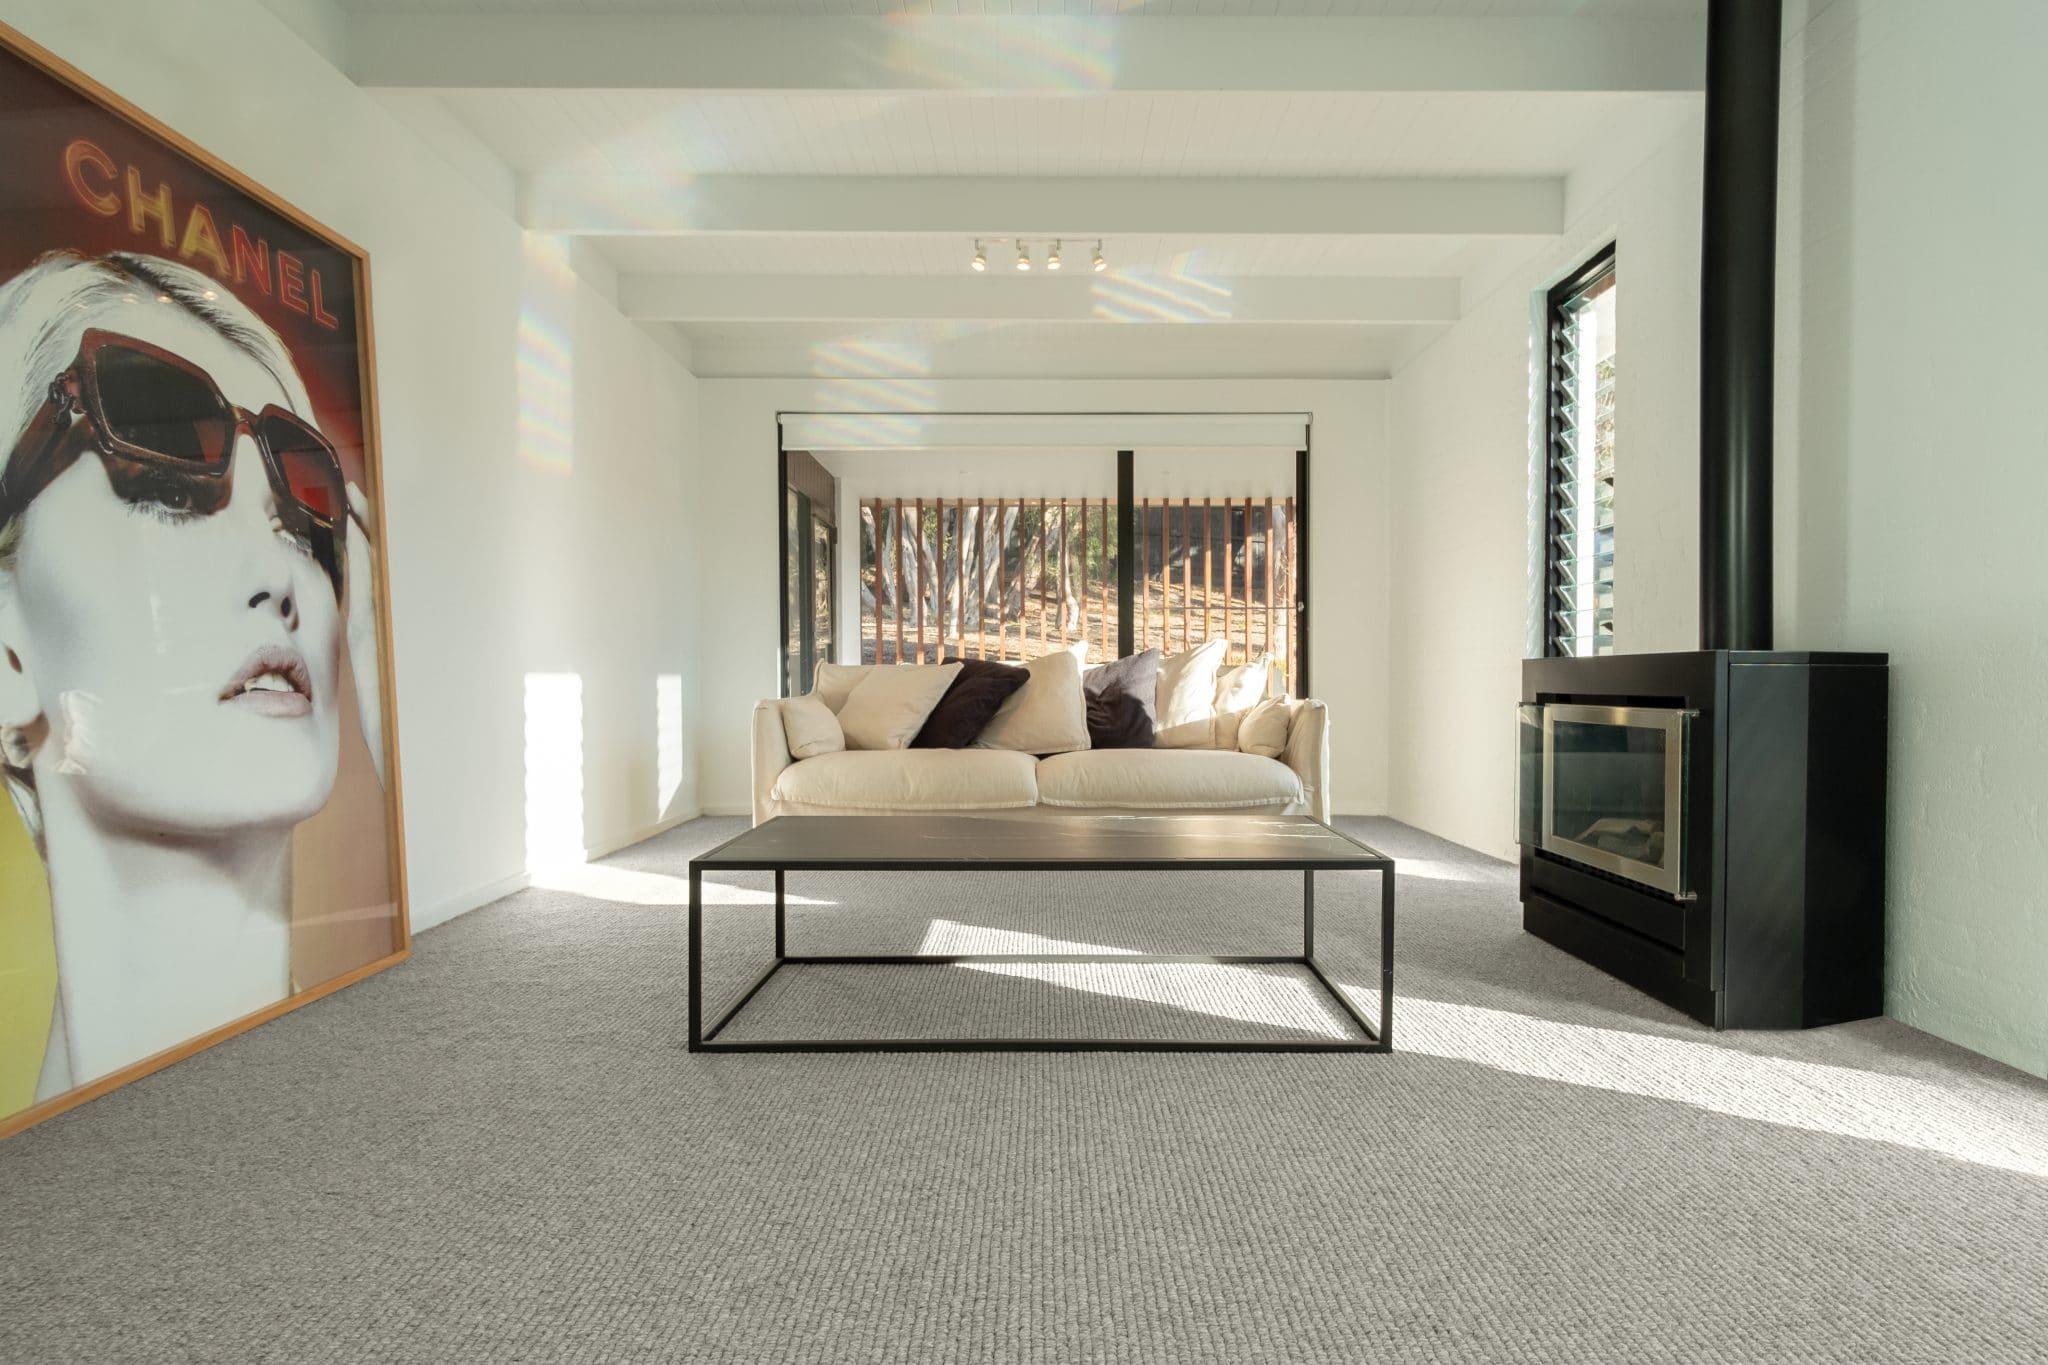 THOR140_Thunder_2 Signature Wool Carpet by Signature Floors Melbourne Carpet Flooring